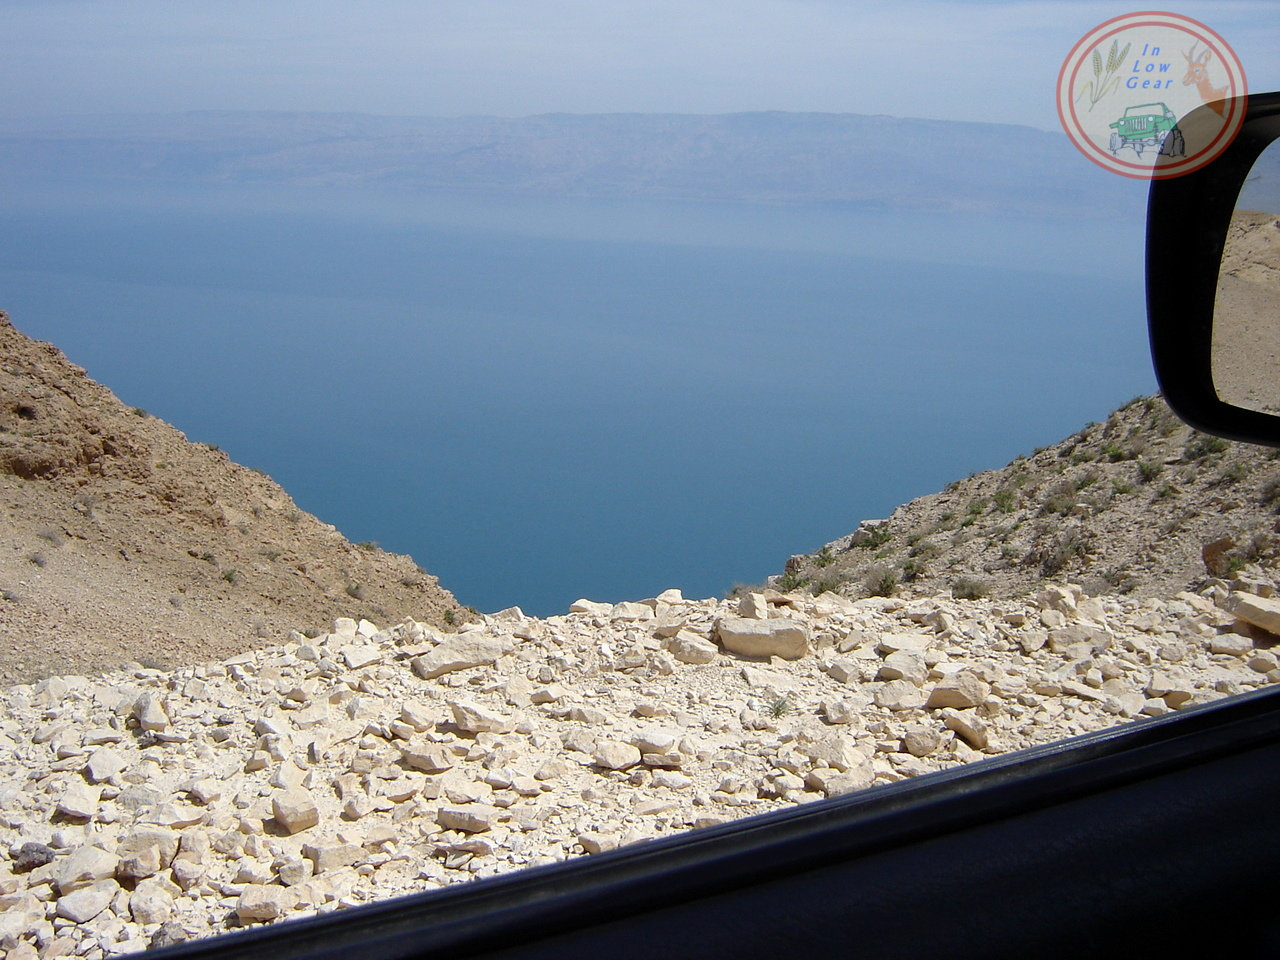 Rosh Chatsatson view of the Dead sea ראש חצצון מדבר יהודה